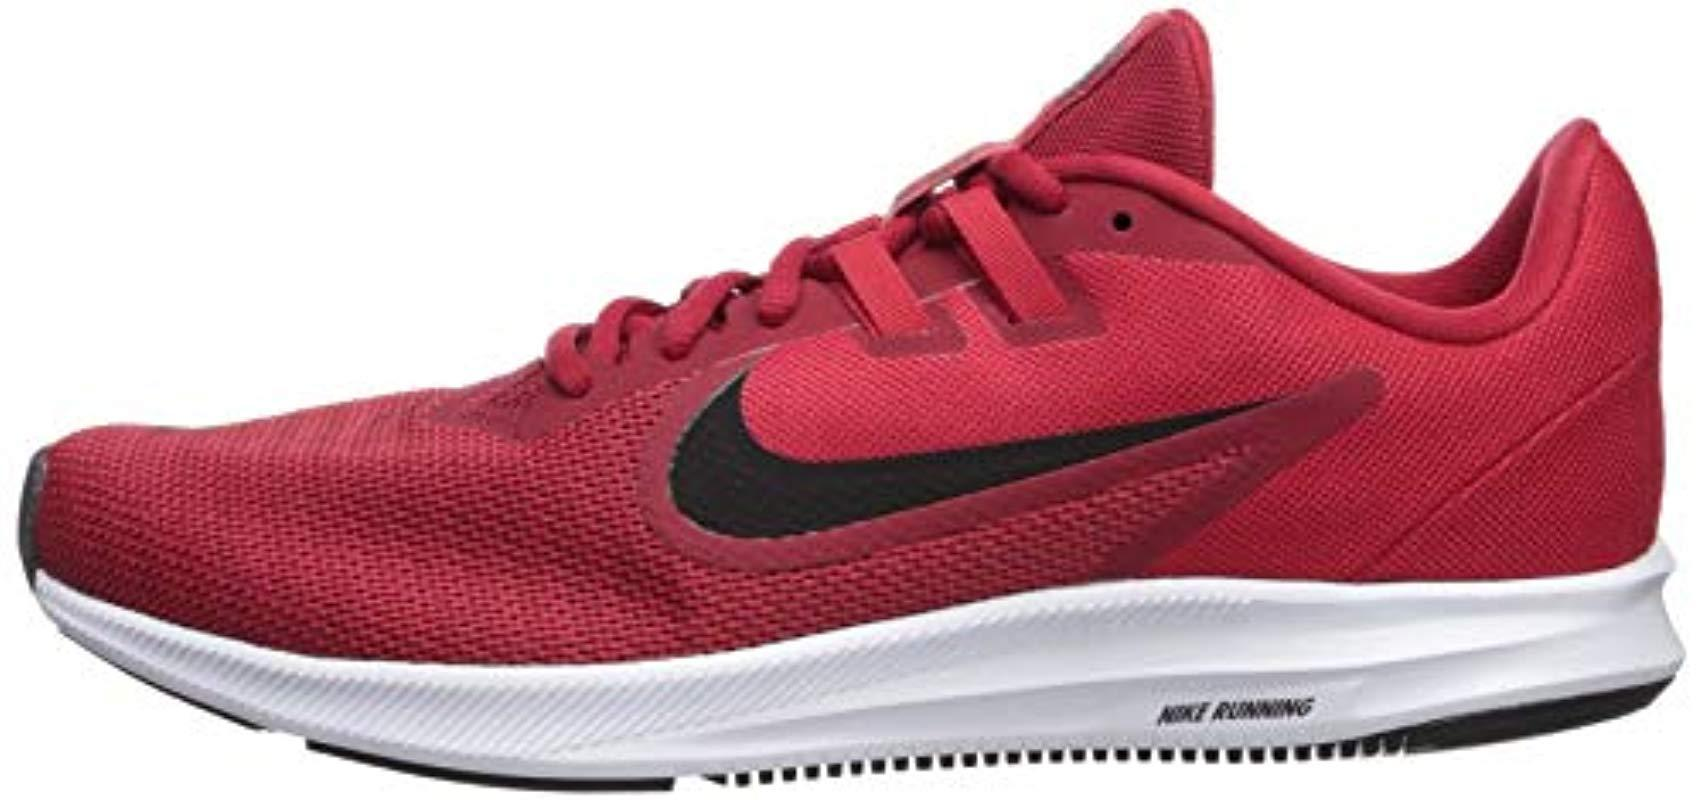 06d6906517eeaa Lyst - Nike Downshifter 9 Sneaker Gym Black-university Red-white